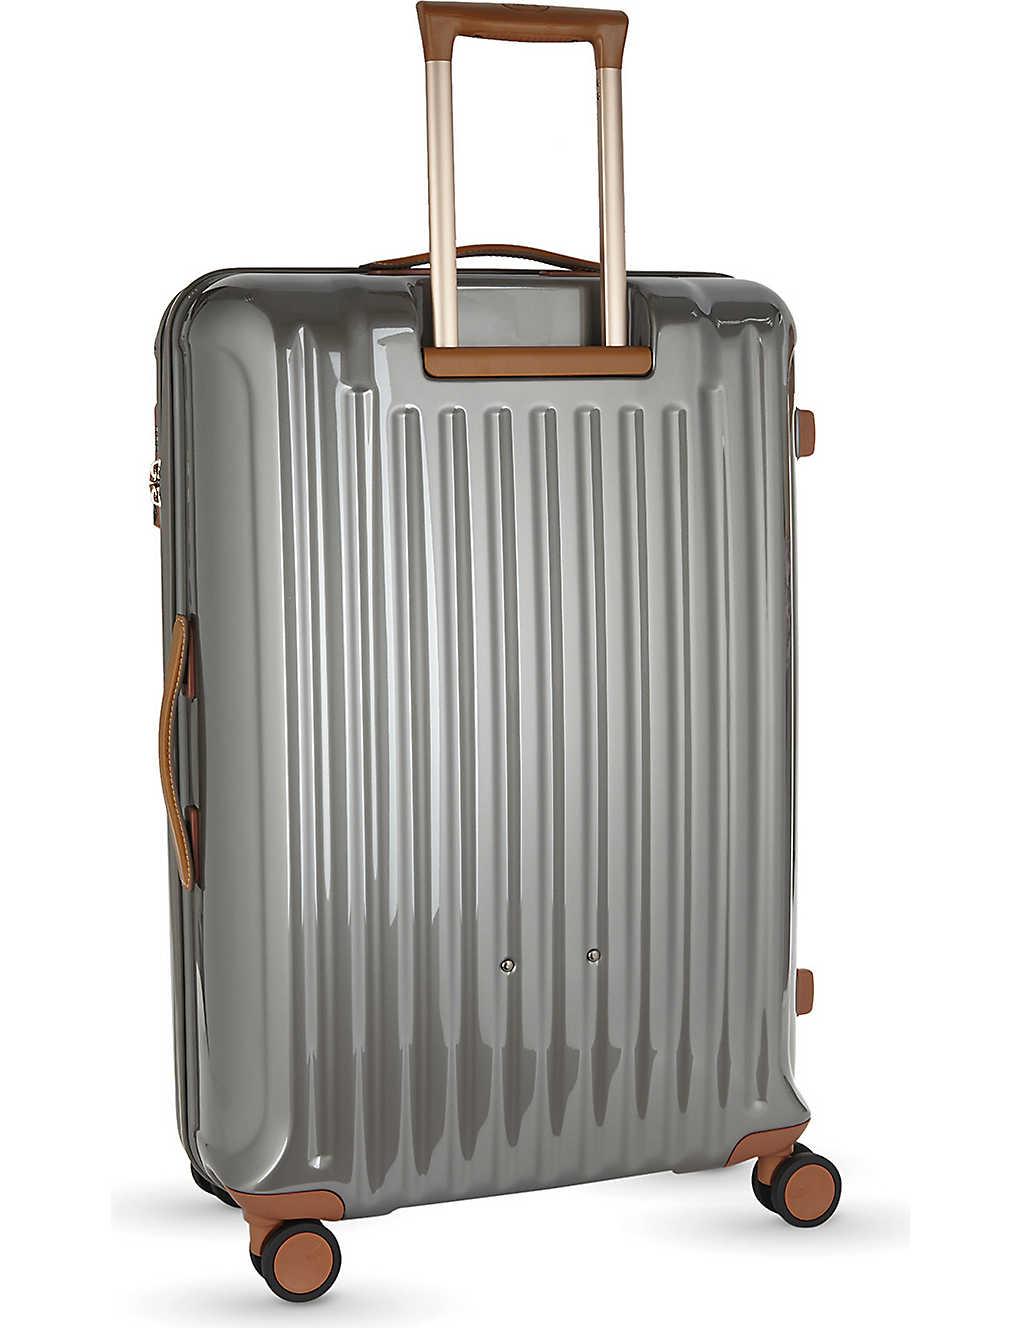 a8ea7720abd1 ... Capri four-wheel trolley suitcase 78cm zoom ...